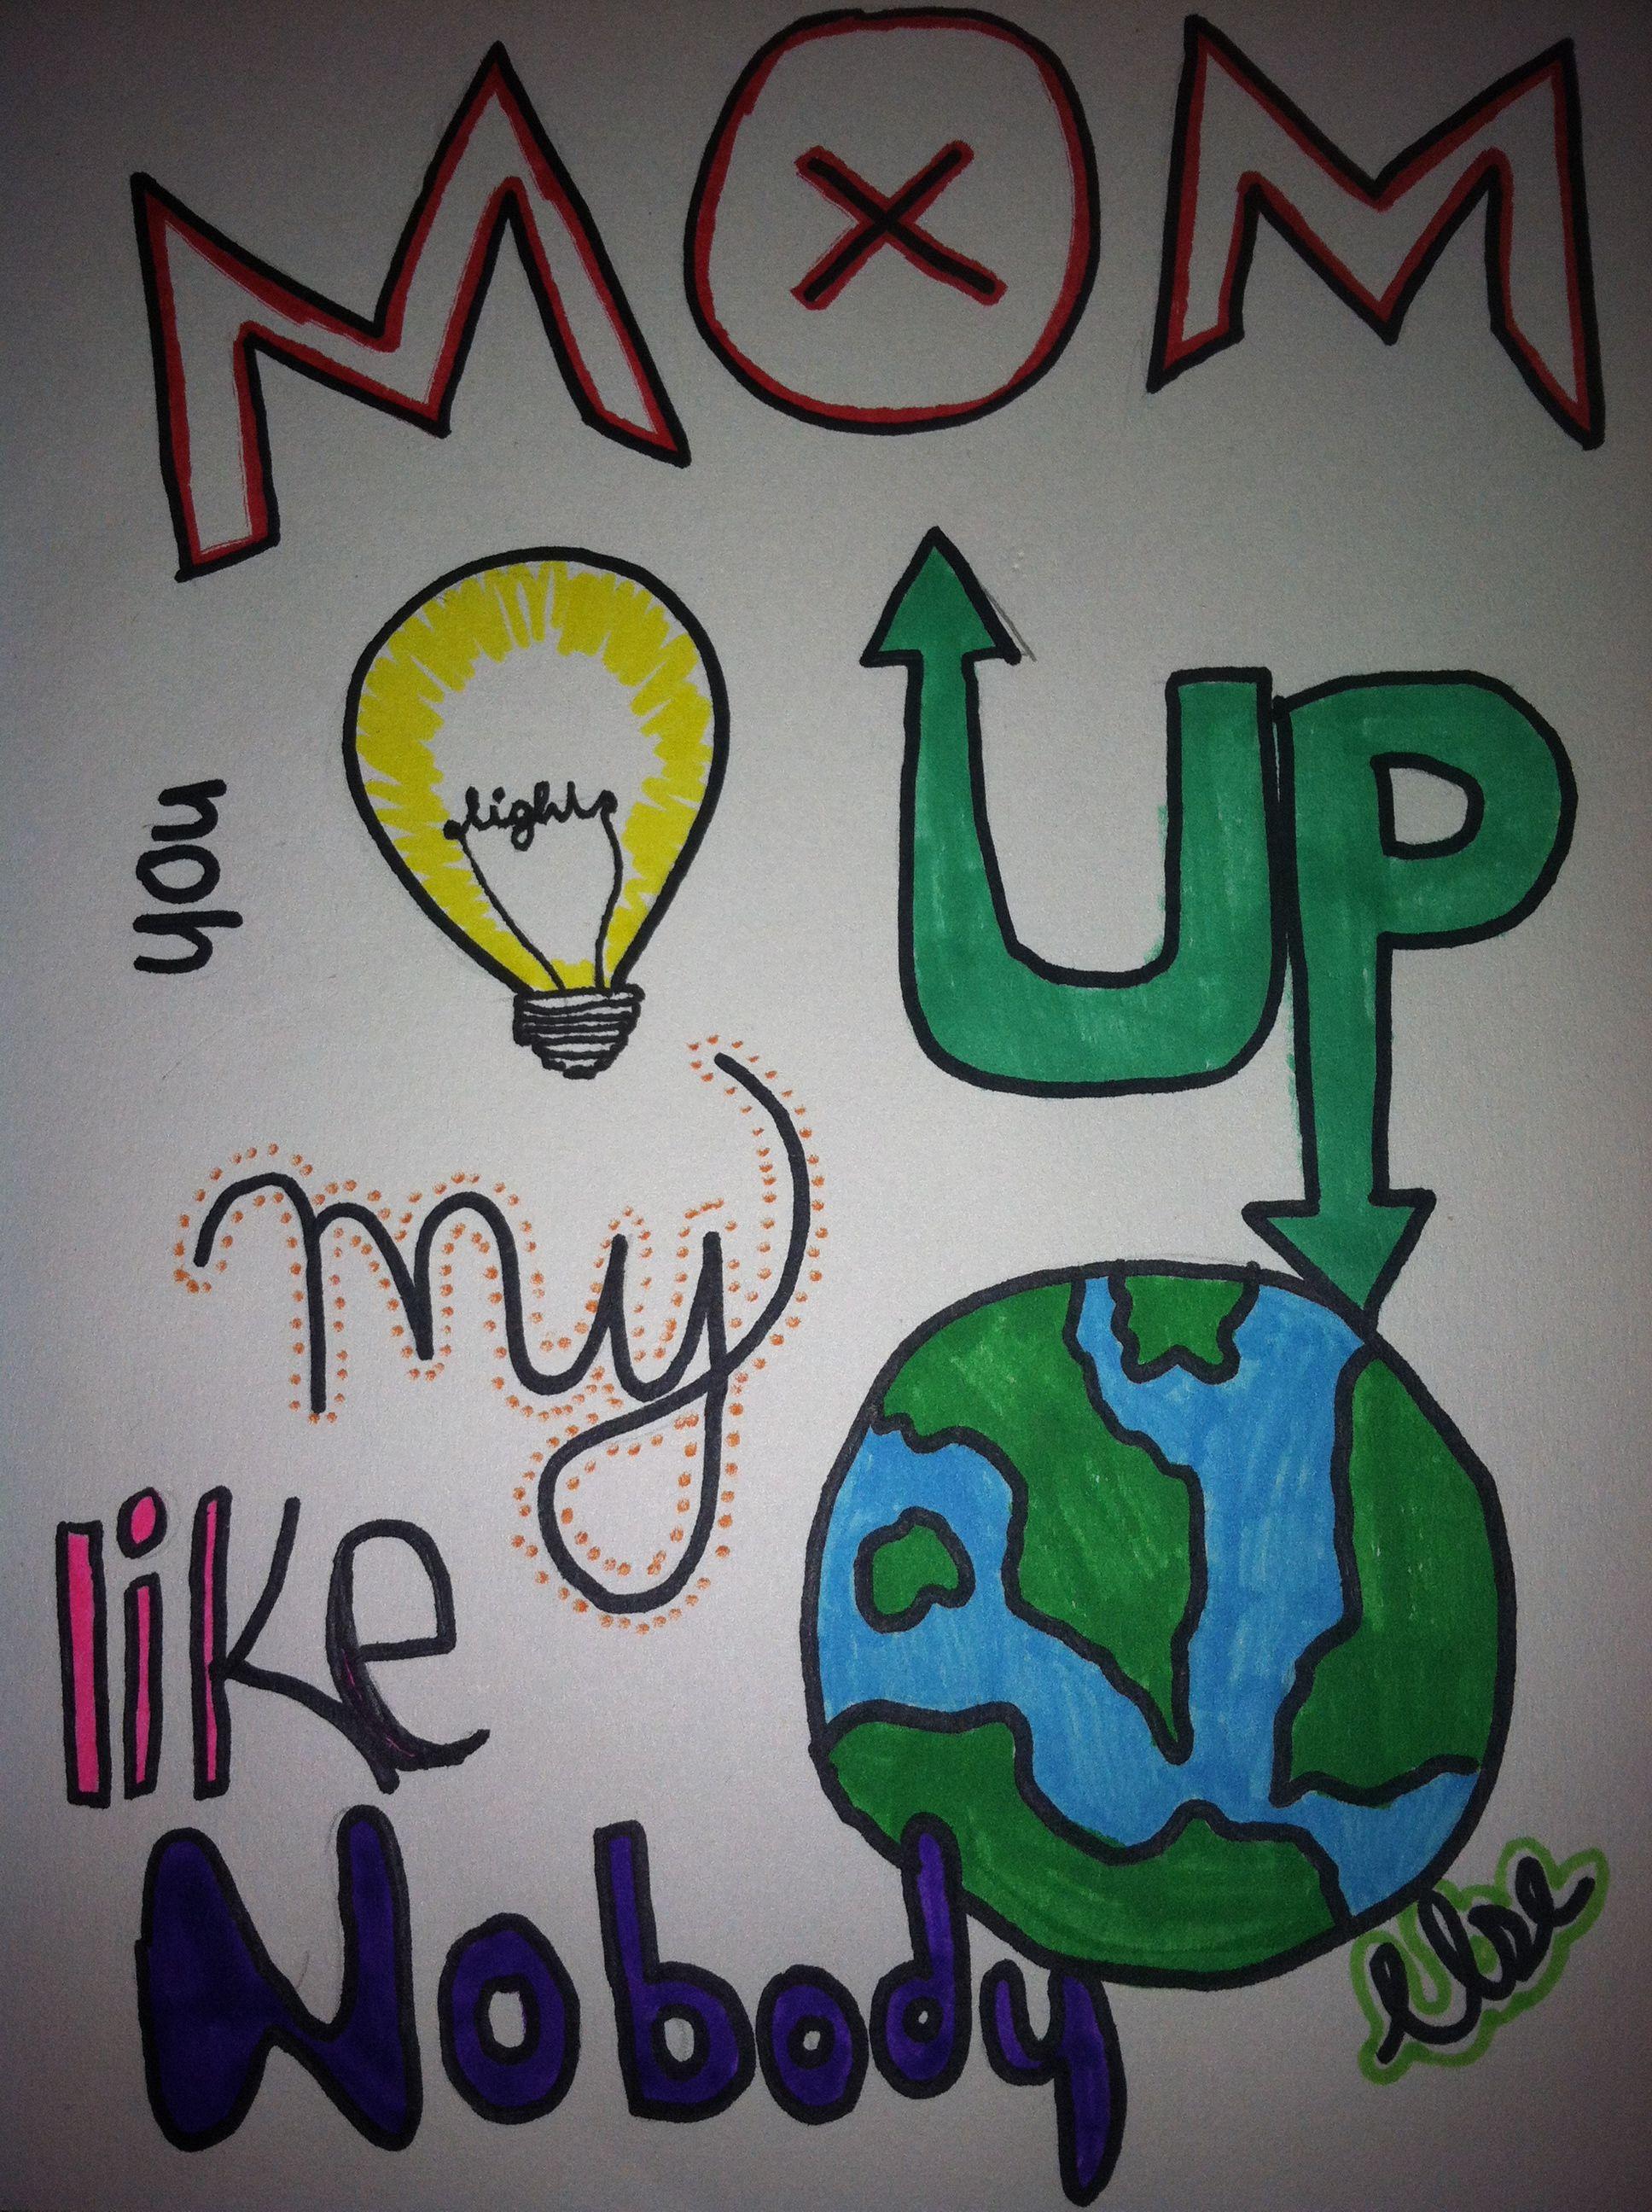 2865dec7f784bac846b6e2338b913a9a » Cute Things To Draw For Your Mom